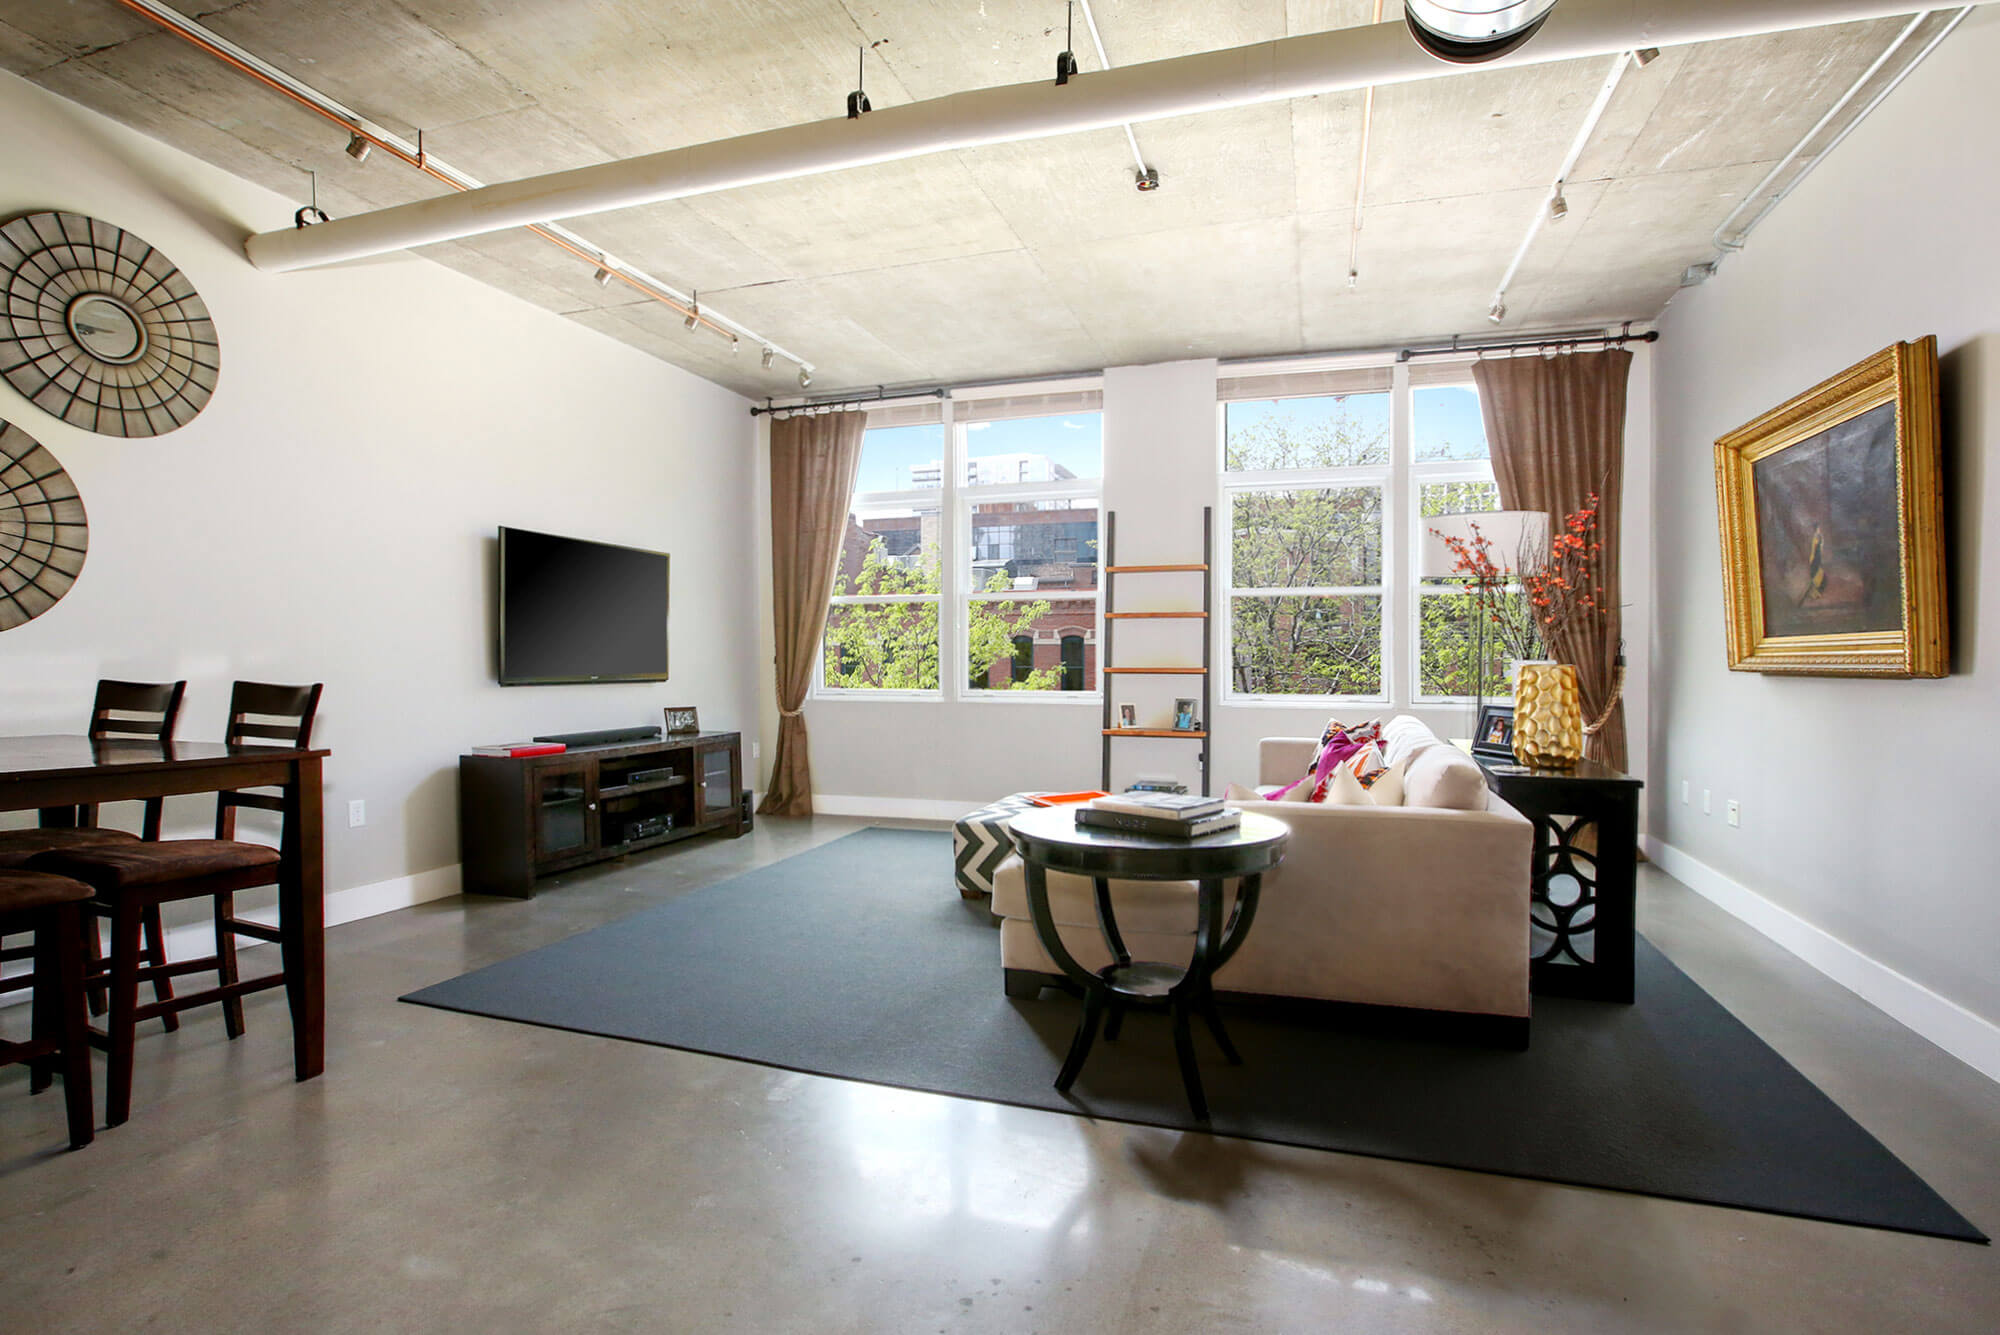 Luxury loft for rent at one of Denver's preeminent luxury residences Titanium Lofts